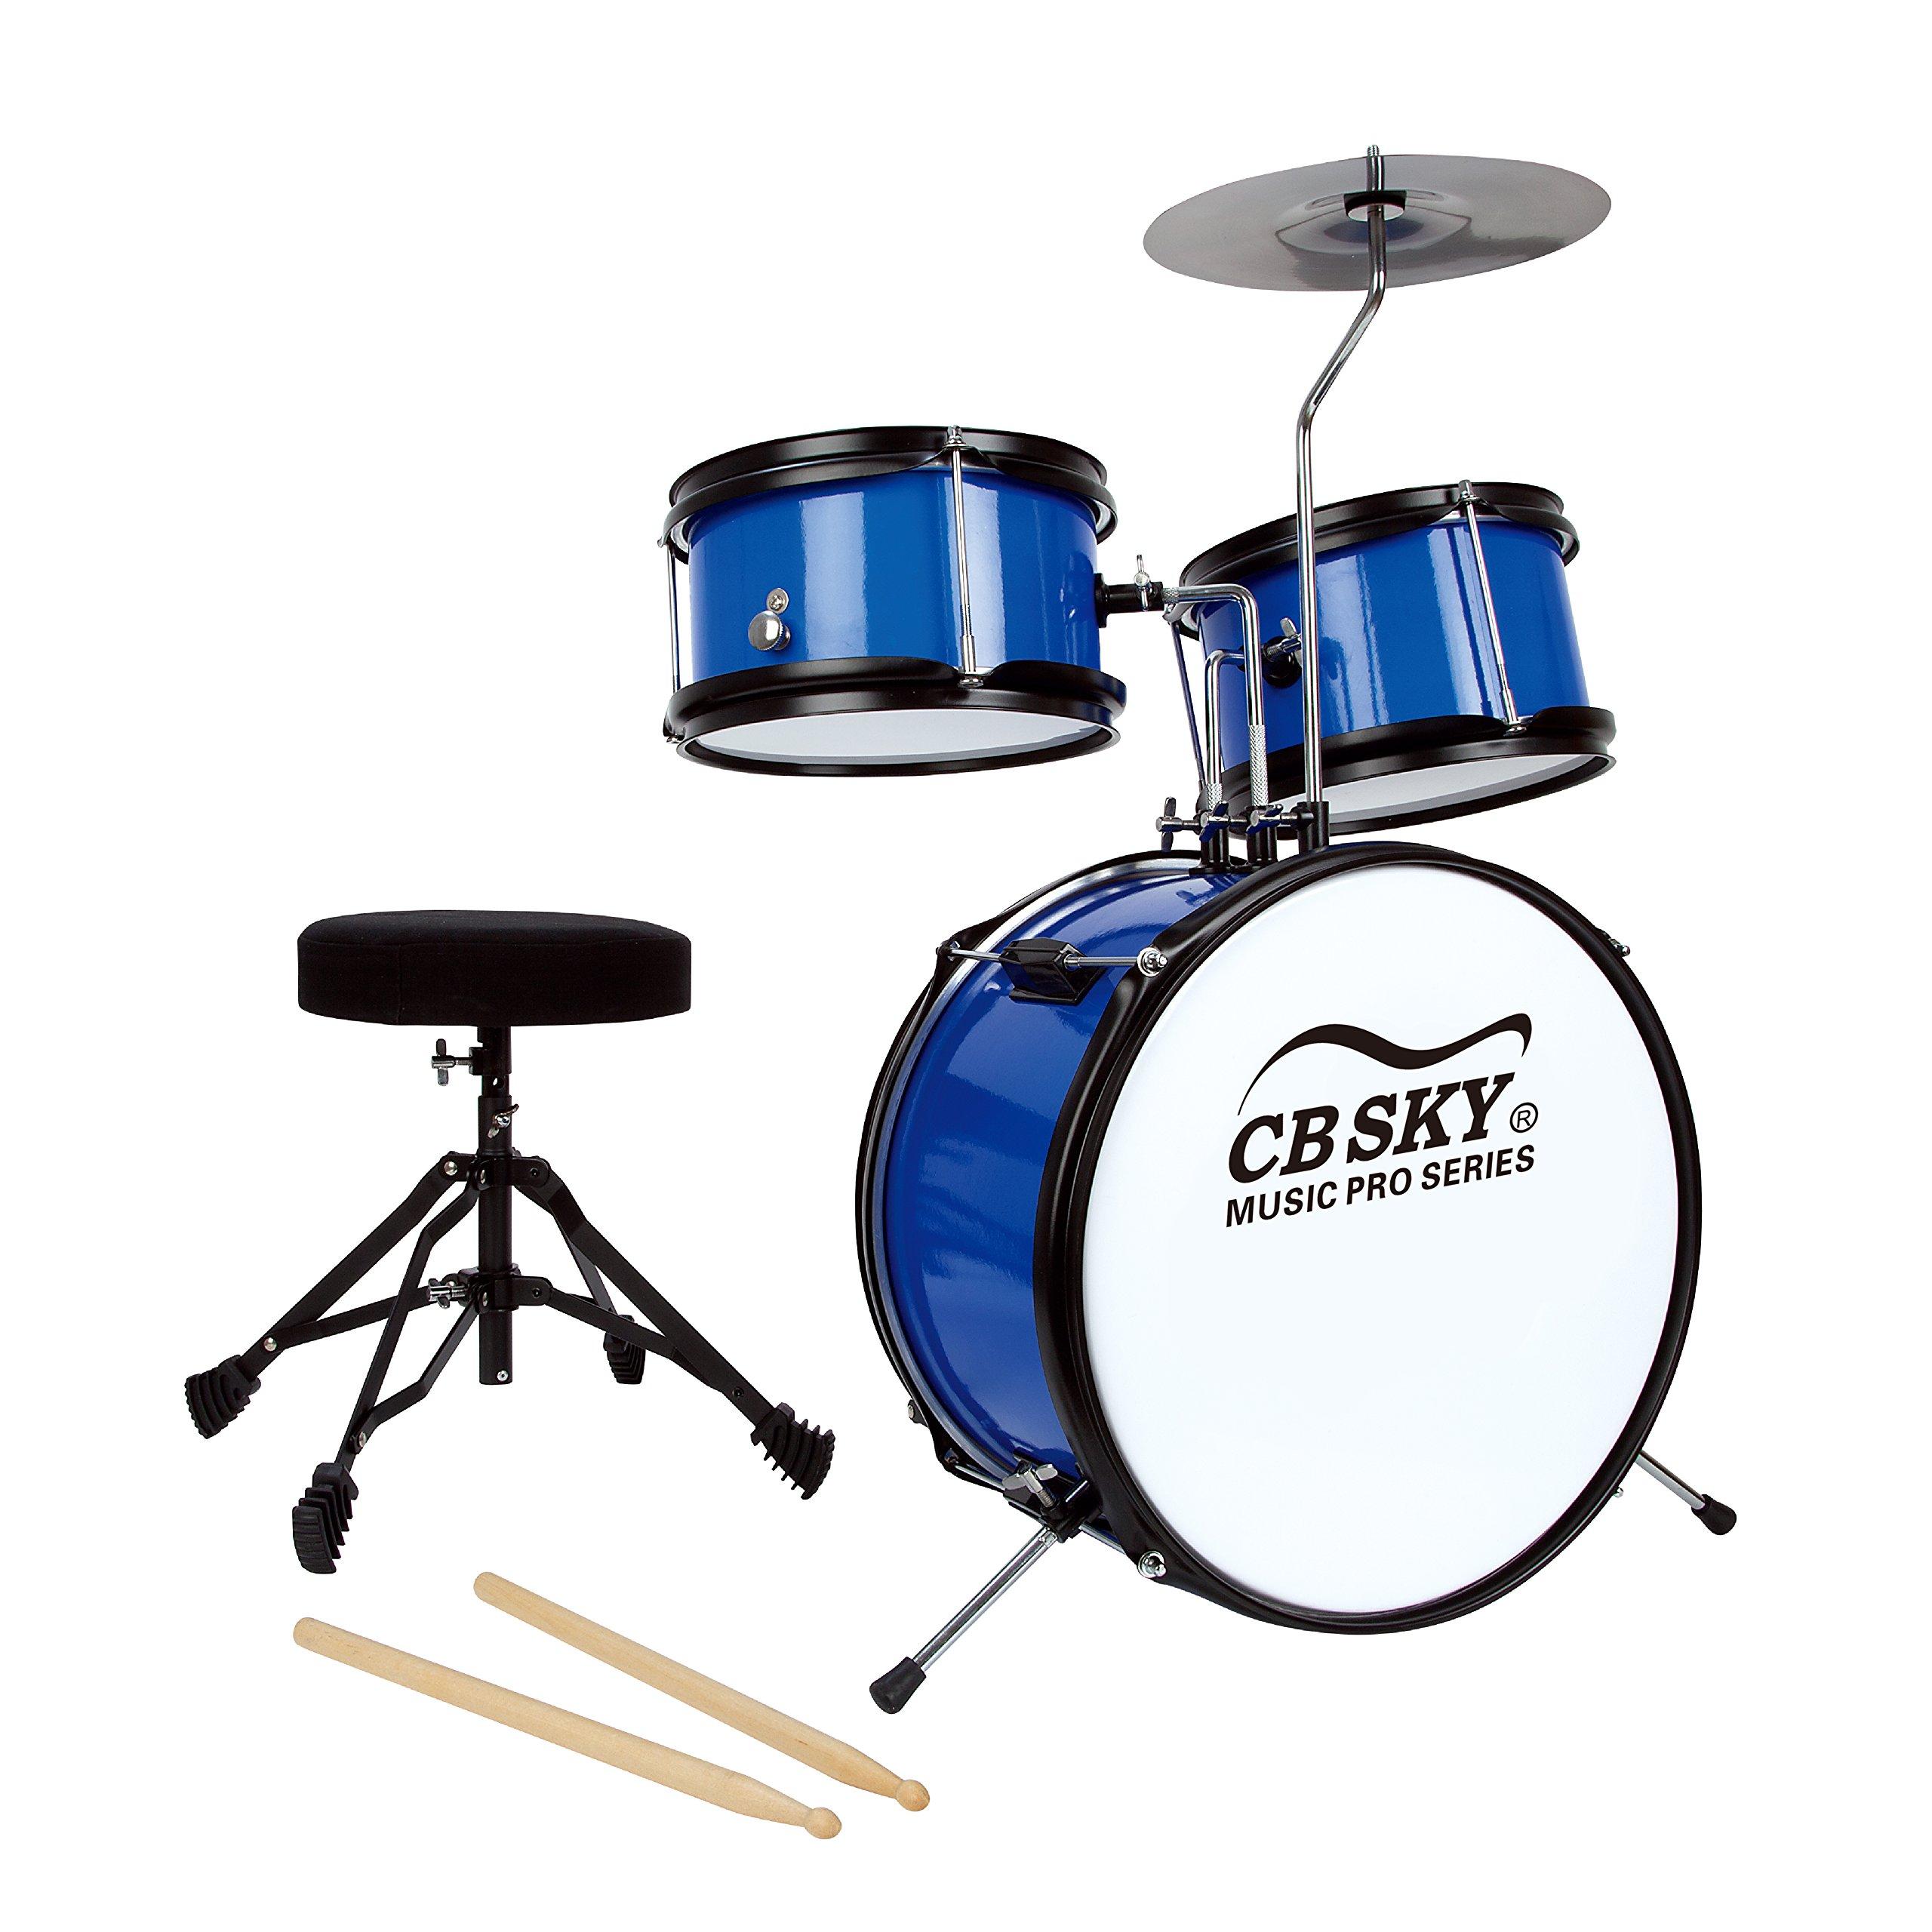 CB SKY 13 inch 5-piece Kids / Junior Drum Set / Biginner (Standard) /Kids musical toys, musical instrument by CB SKY